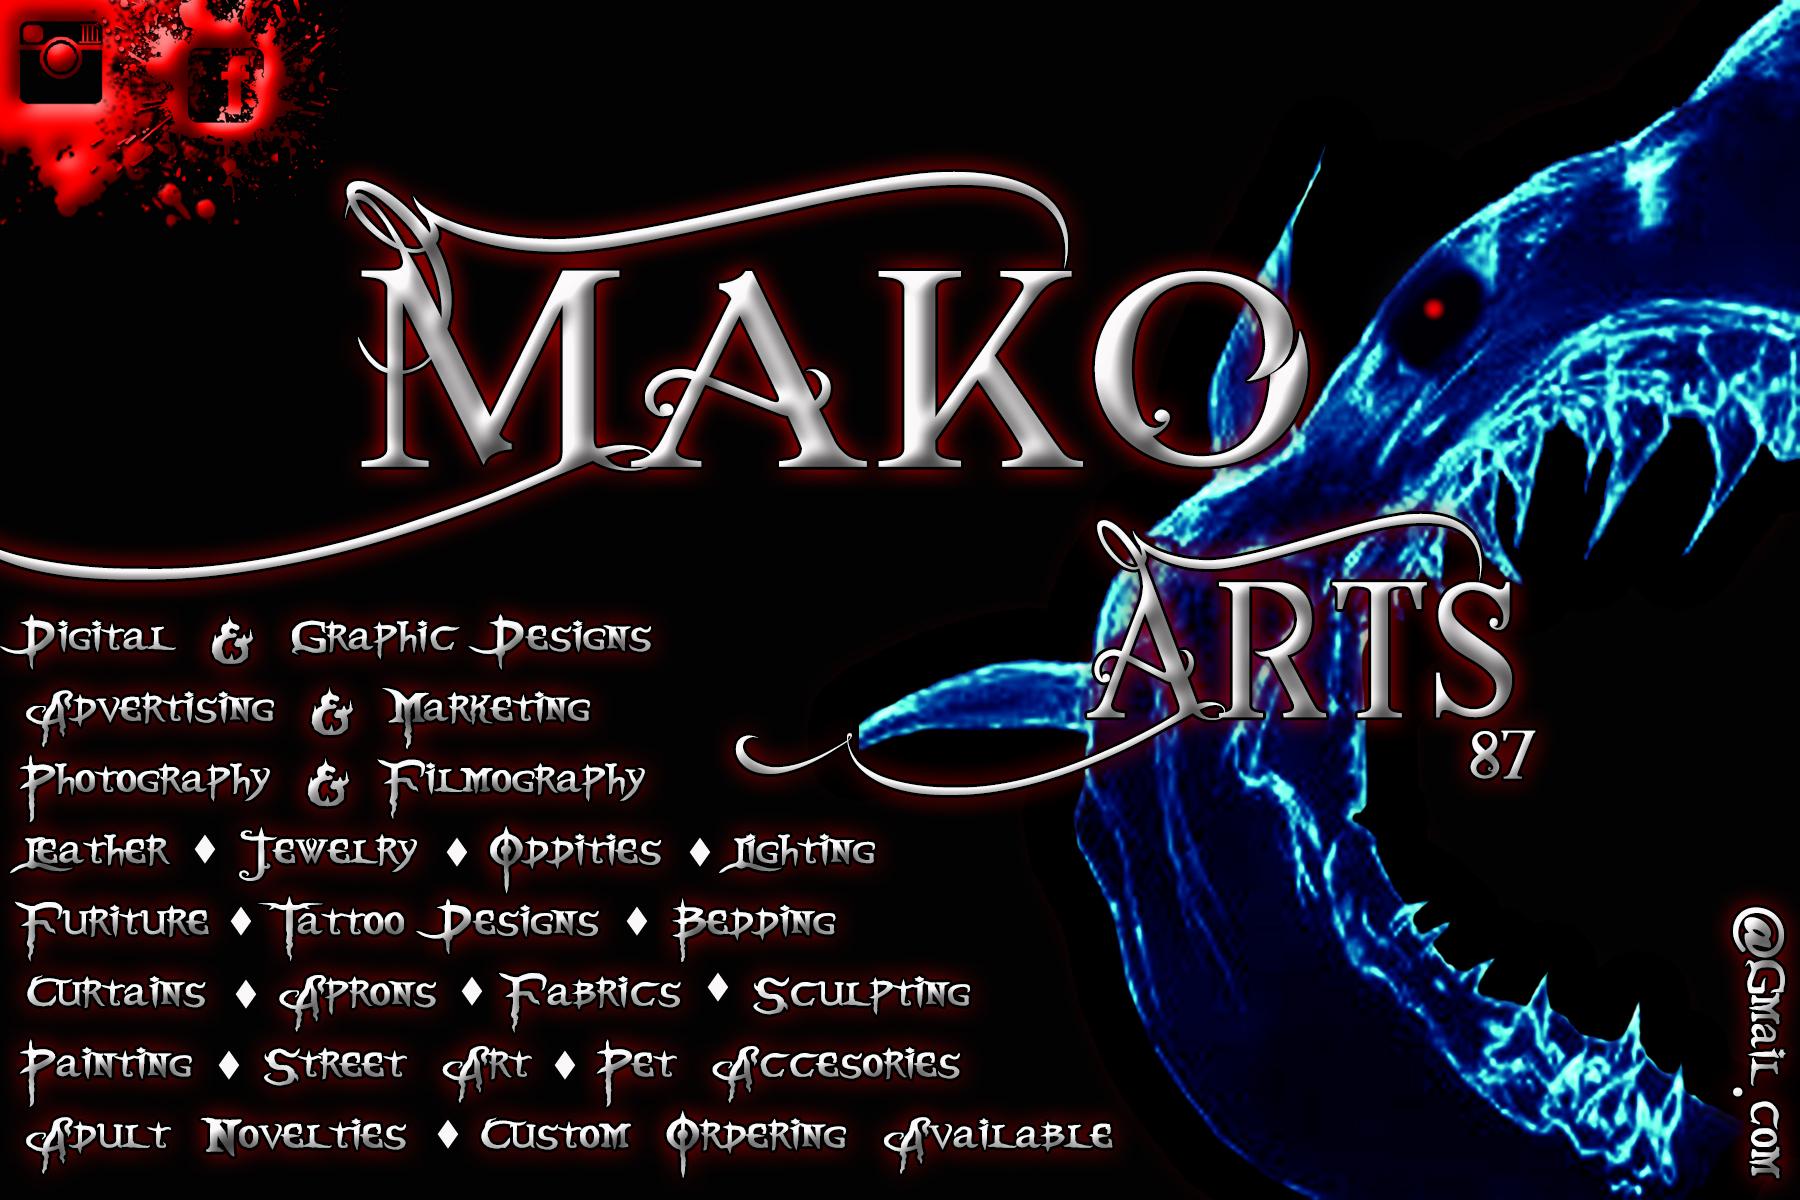 TattSlug&Mako image